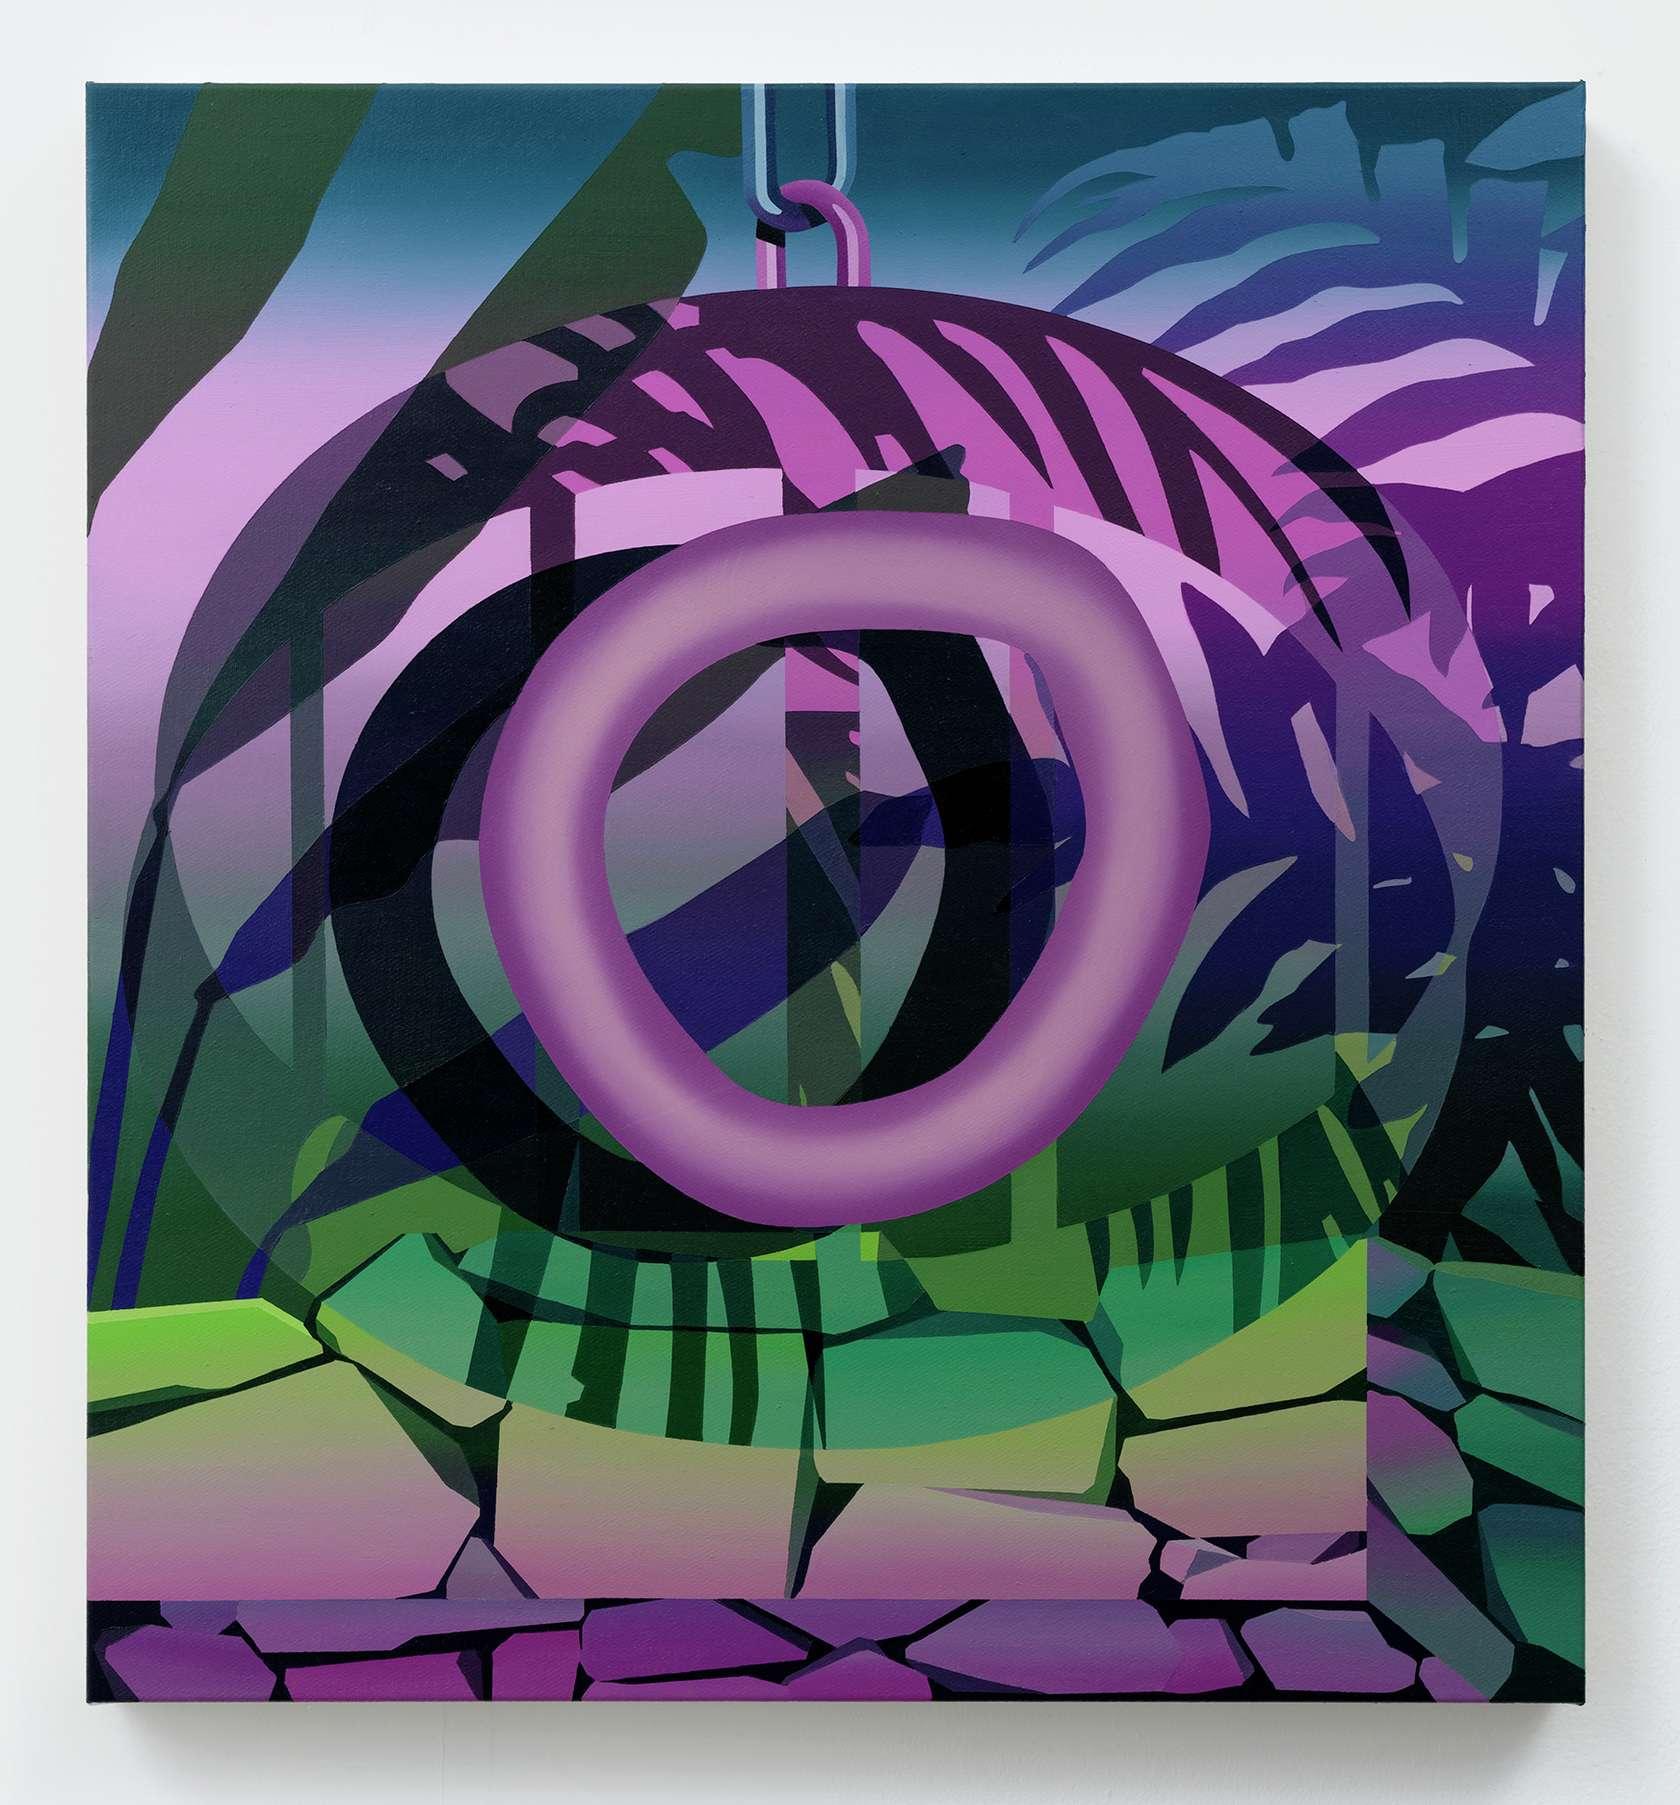 Amélie Bertrand, The Watcher II, 2019 Huile sur toile65 × 60 cm / 25 5/8 × 23 5/8 in.